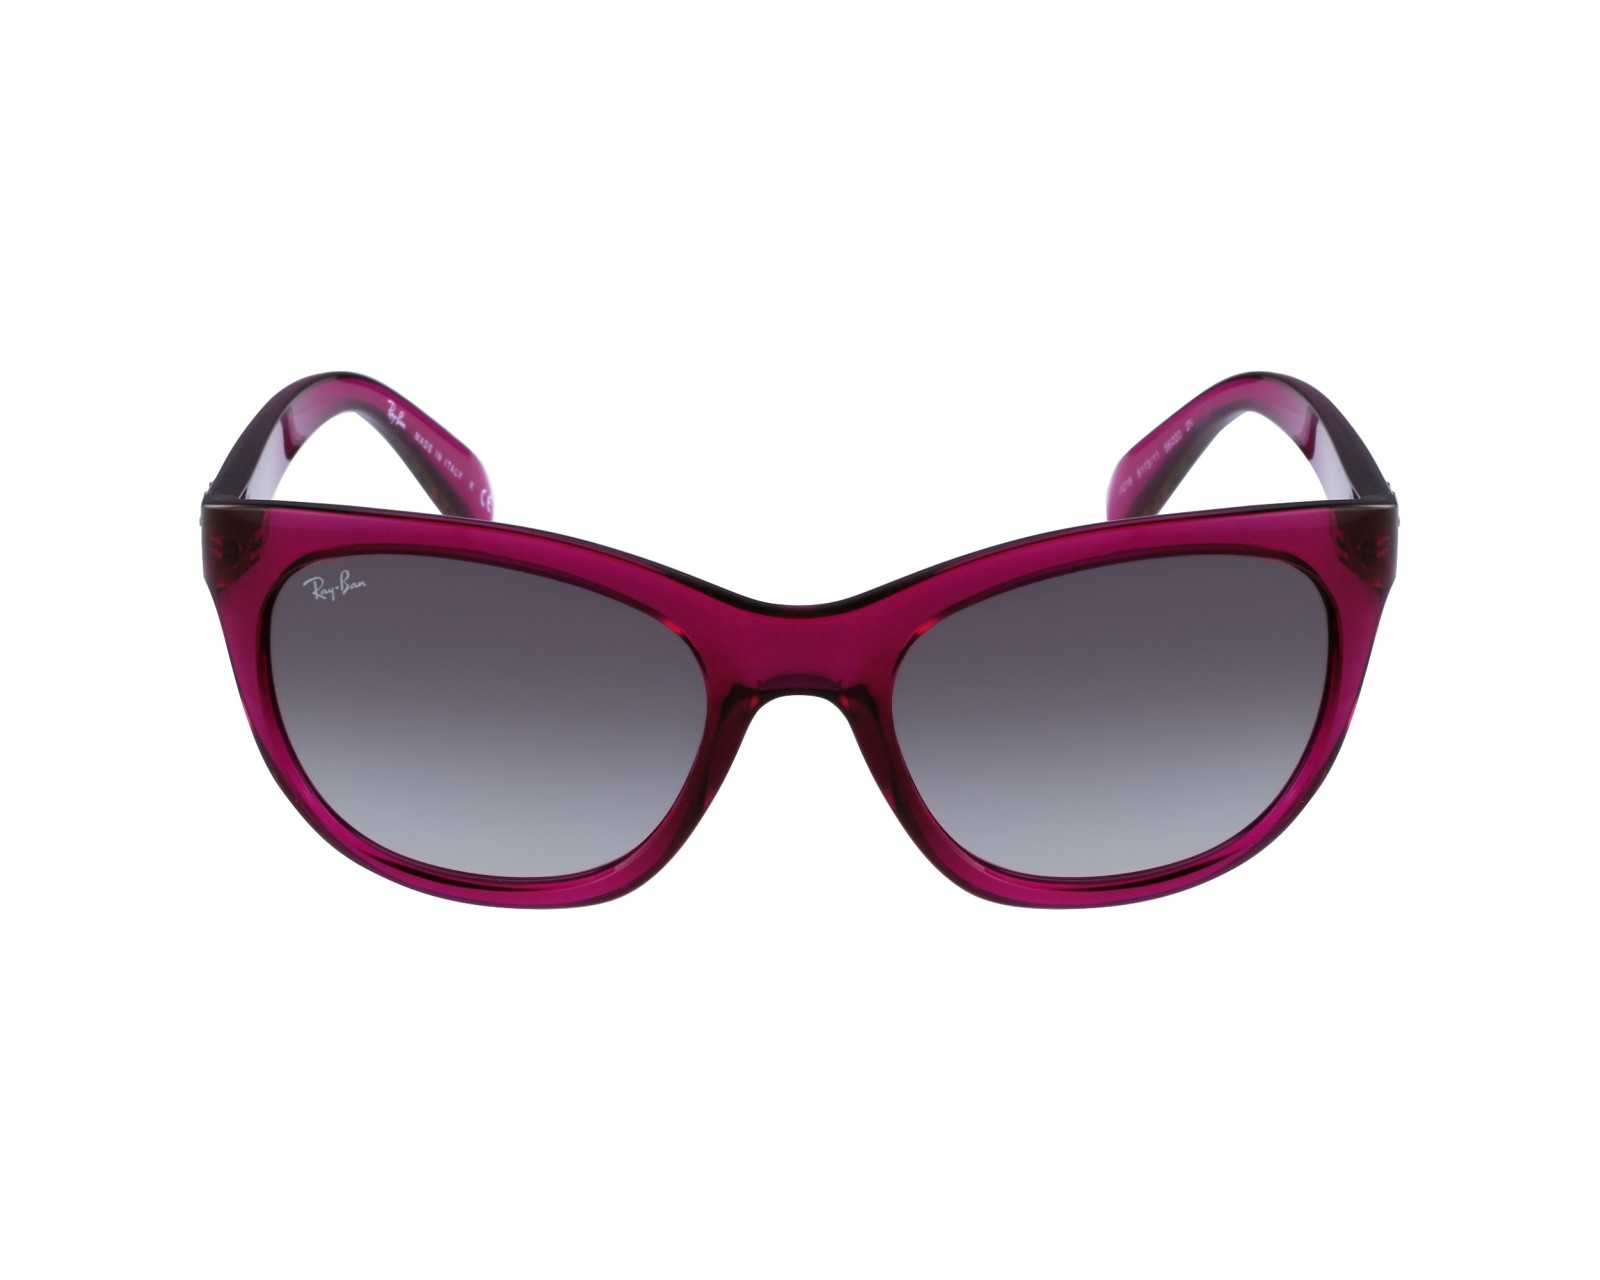 d19e0480ee Sunglasses Ray-Ban RB-4216 617311 - Purple profile view